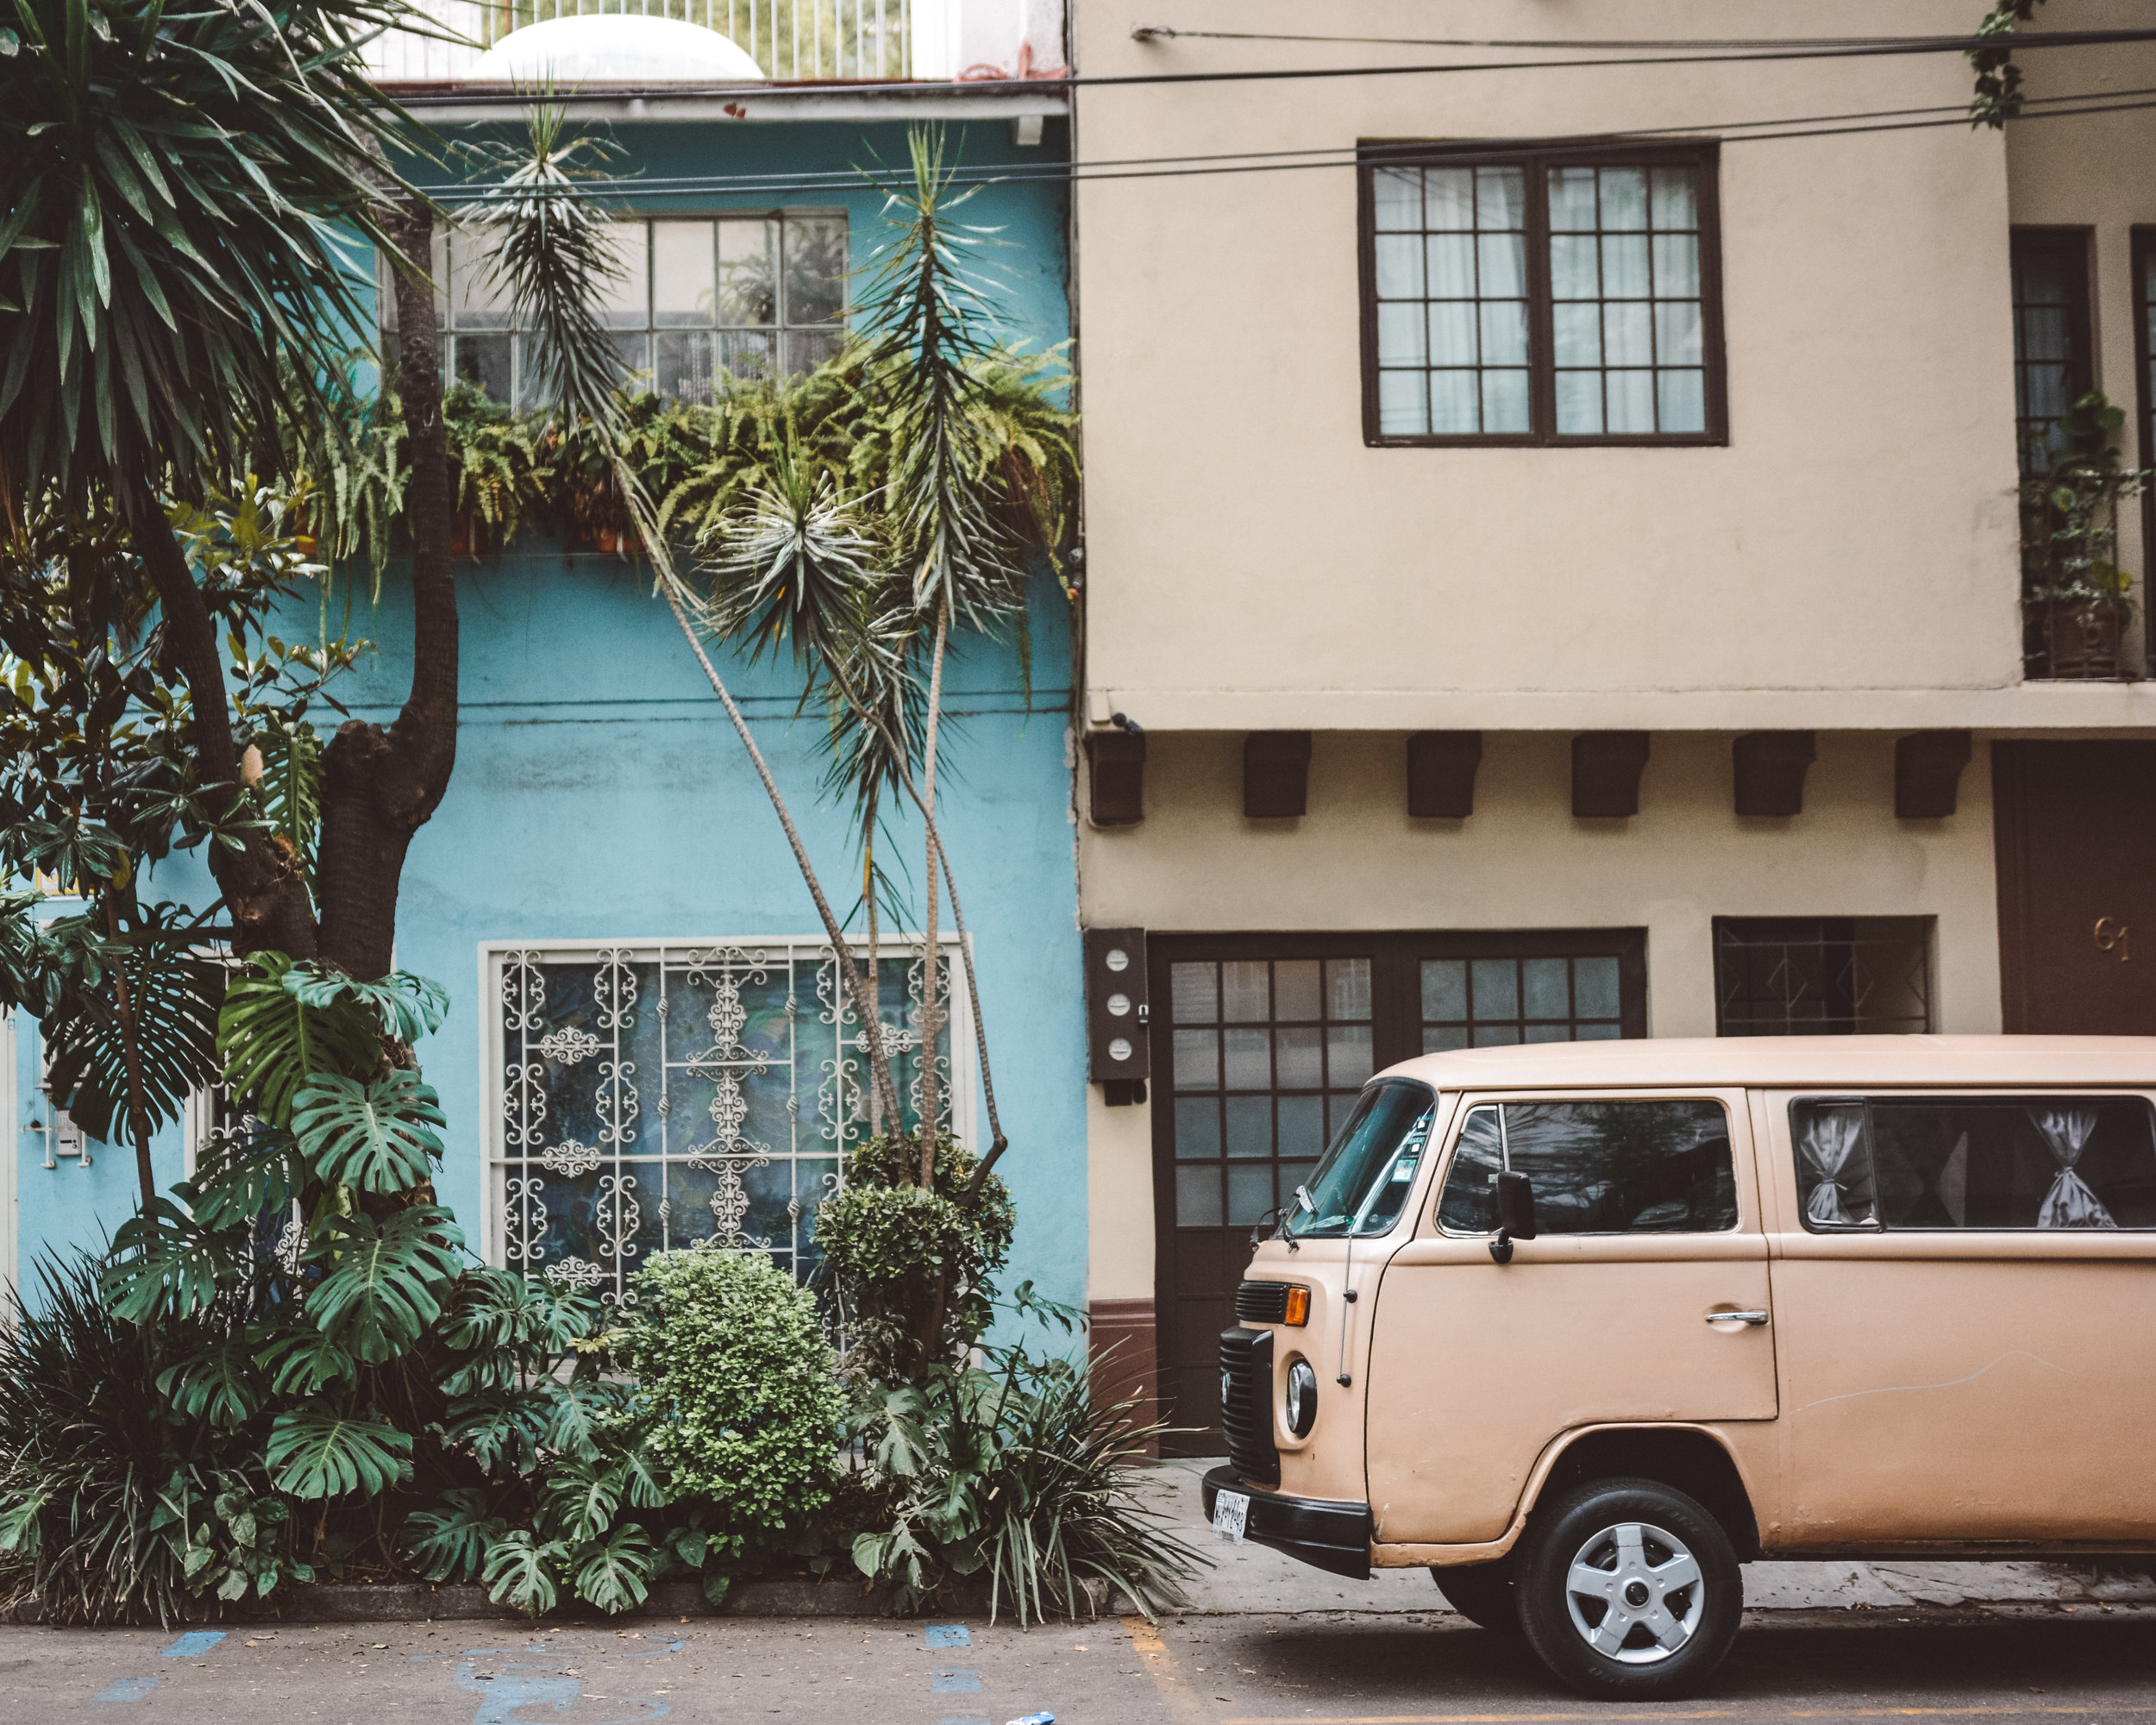 Condesa Neighborhood, Mexico City